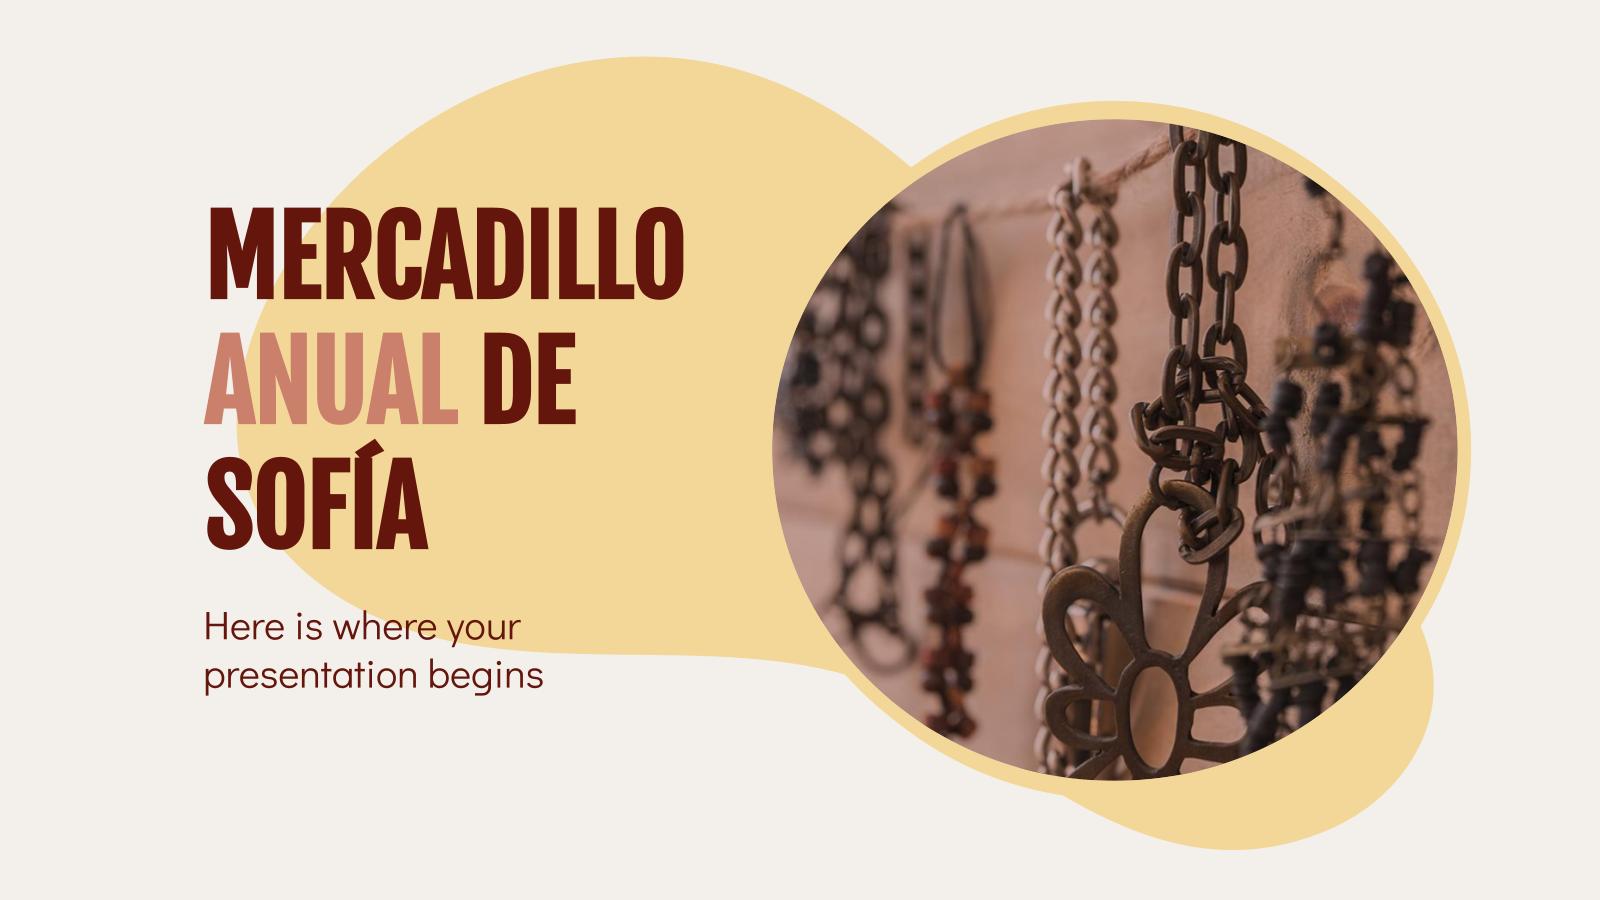 Modelo de apresentação Mercadillo Anual de Sofía